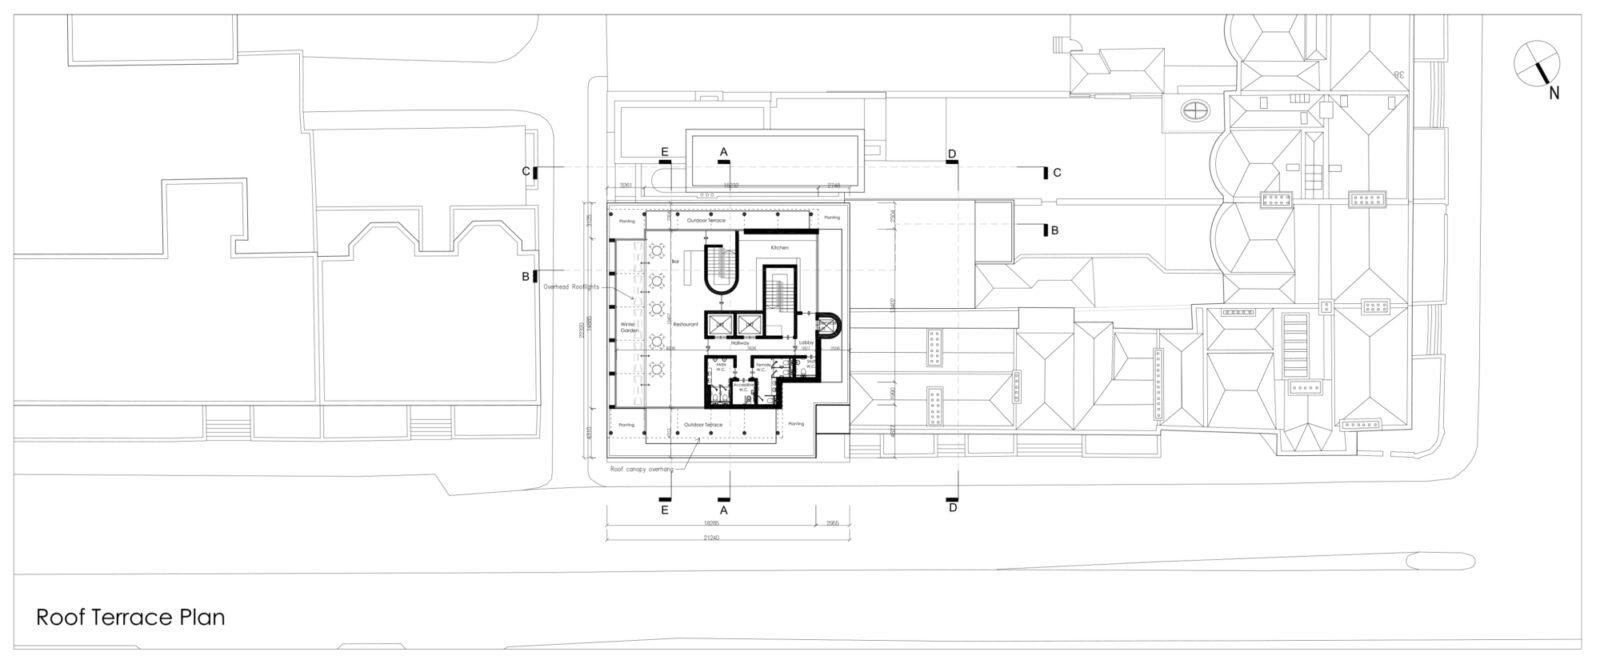 Msh Roof Terrace Plan